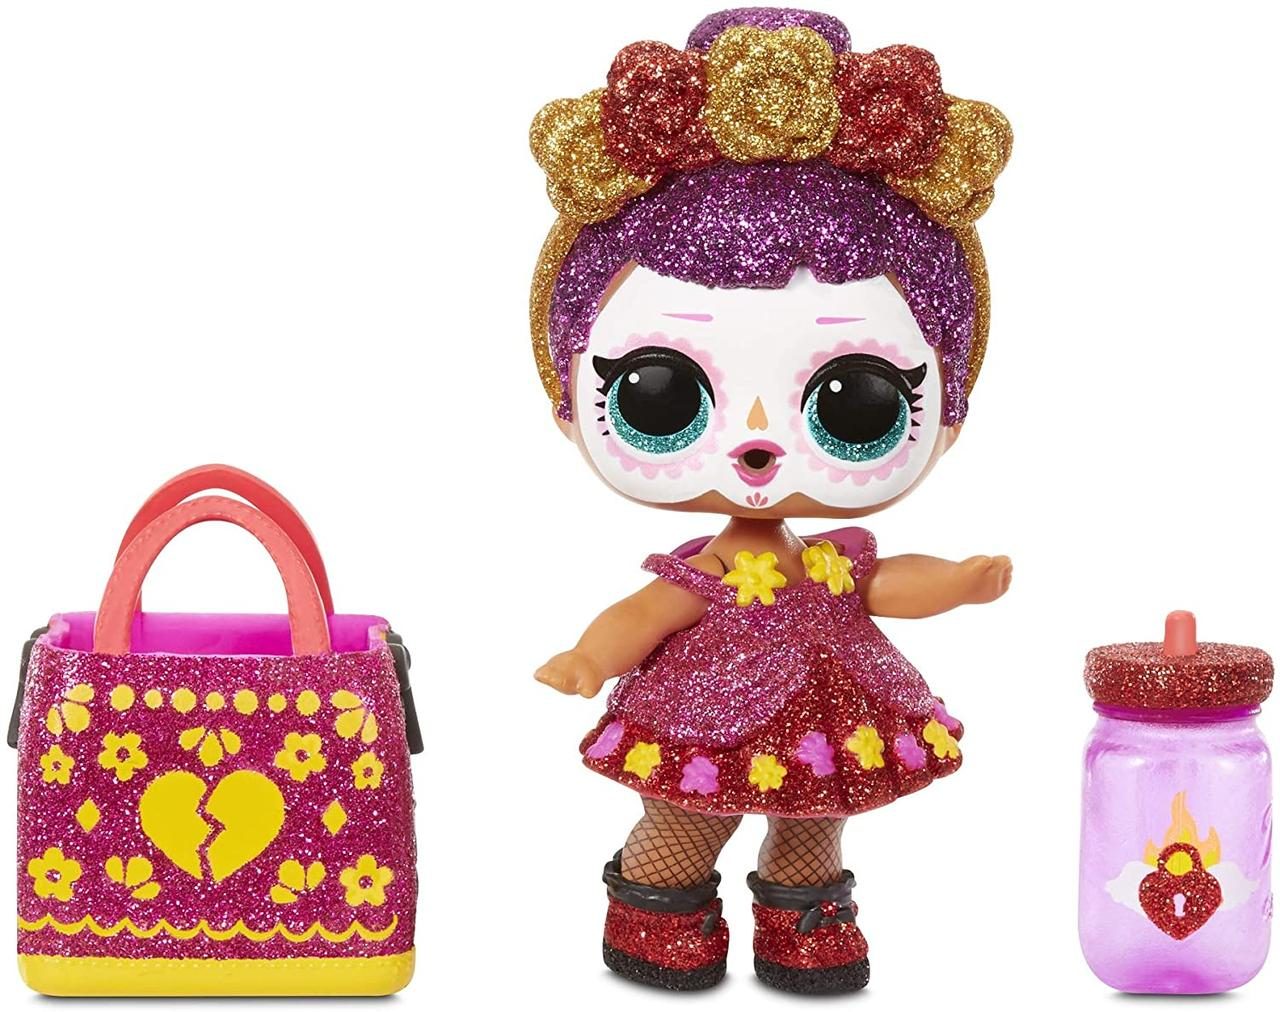 Лялька ЛОЛ Боніта Хелловін L. O. L. Surprise! Spooky Sparkle Limited Edition Bebé Bonita with 7 Surprises